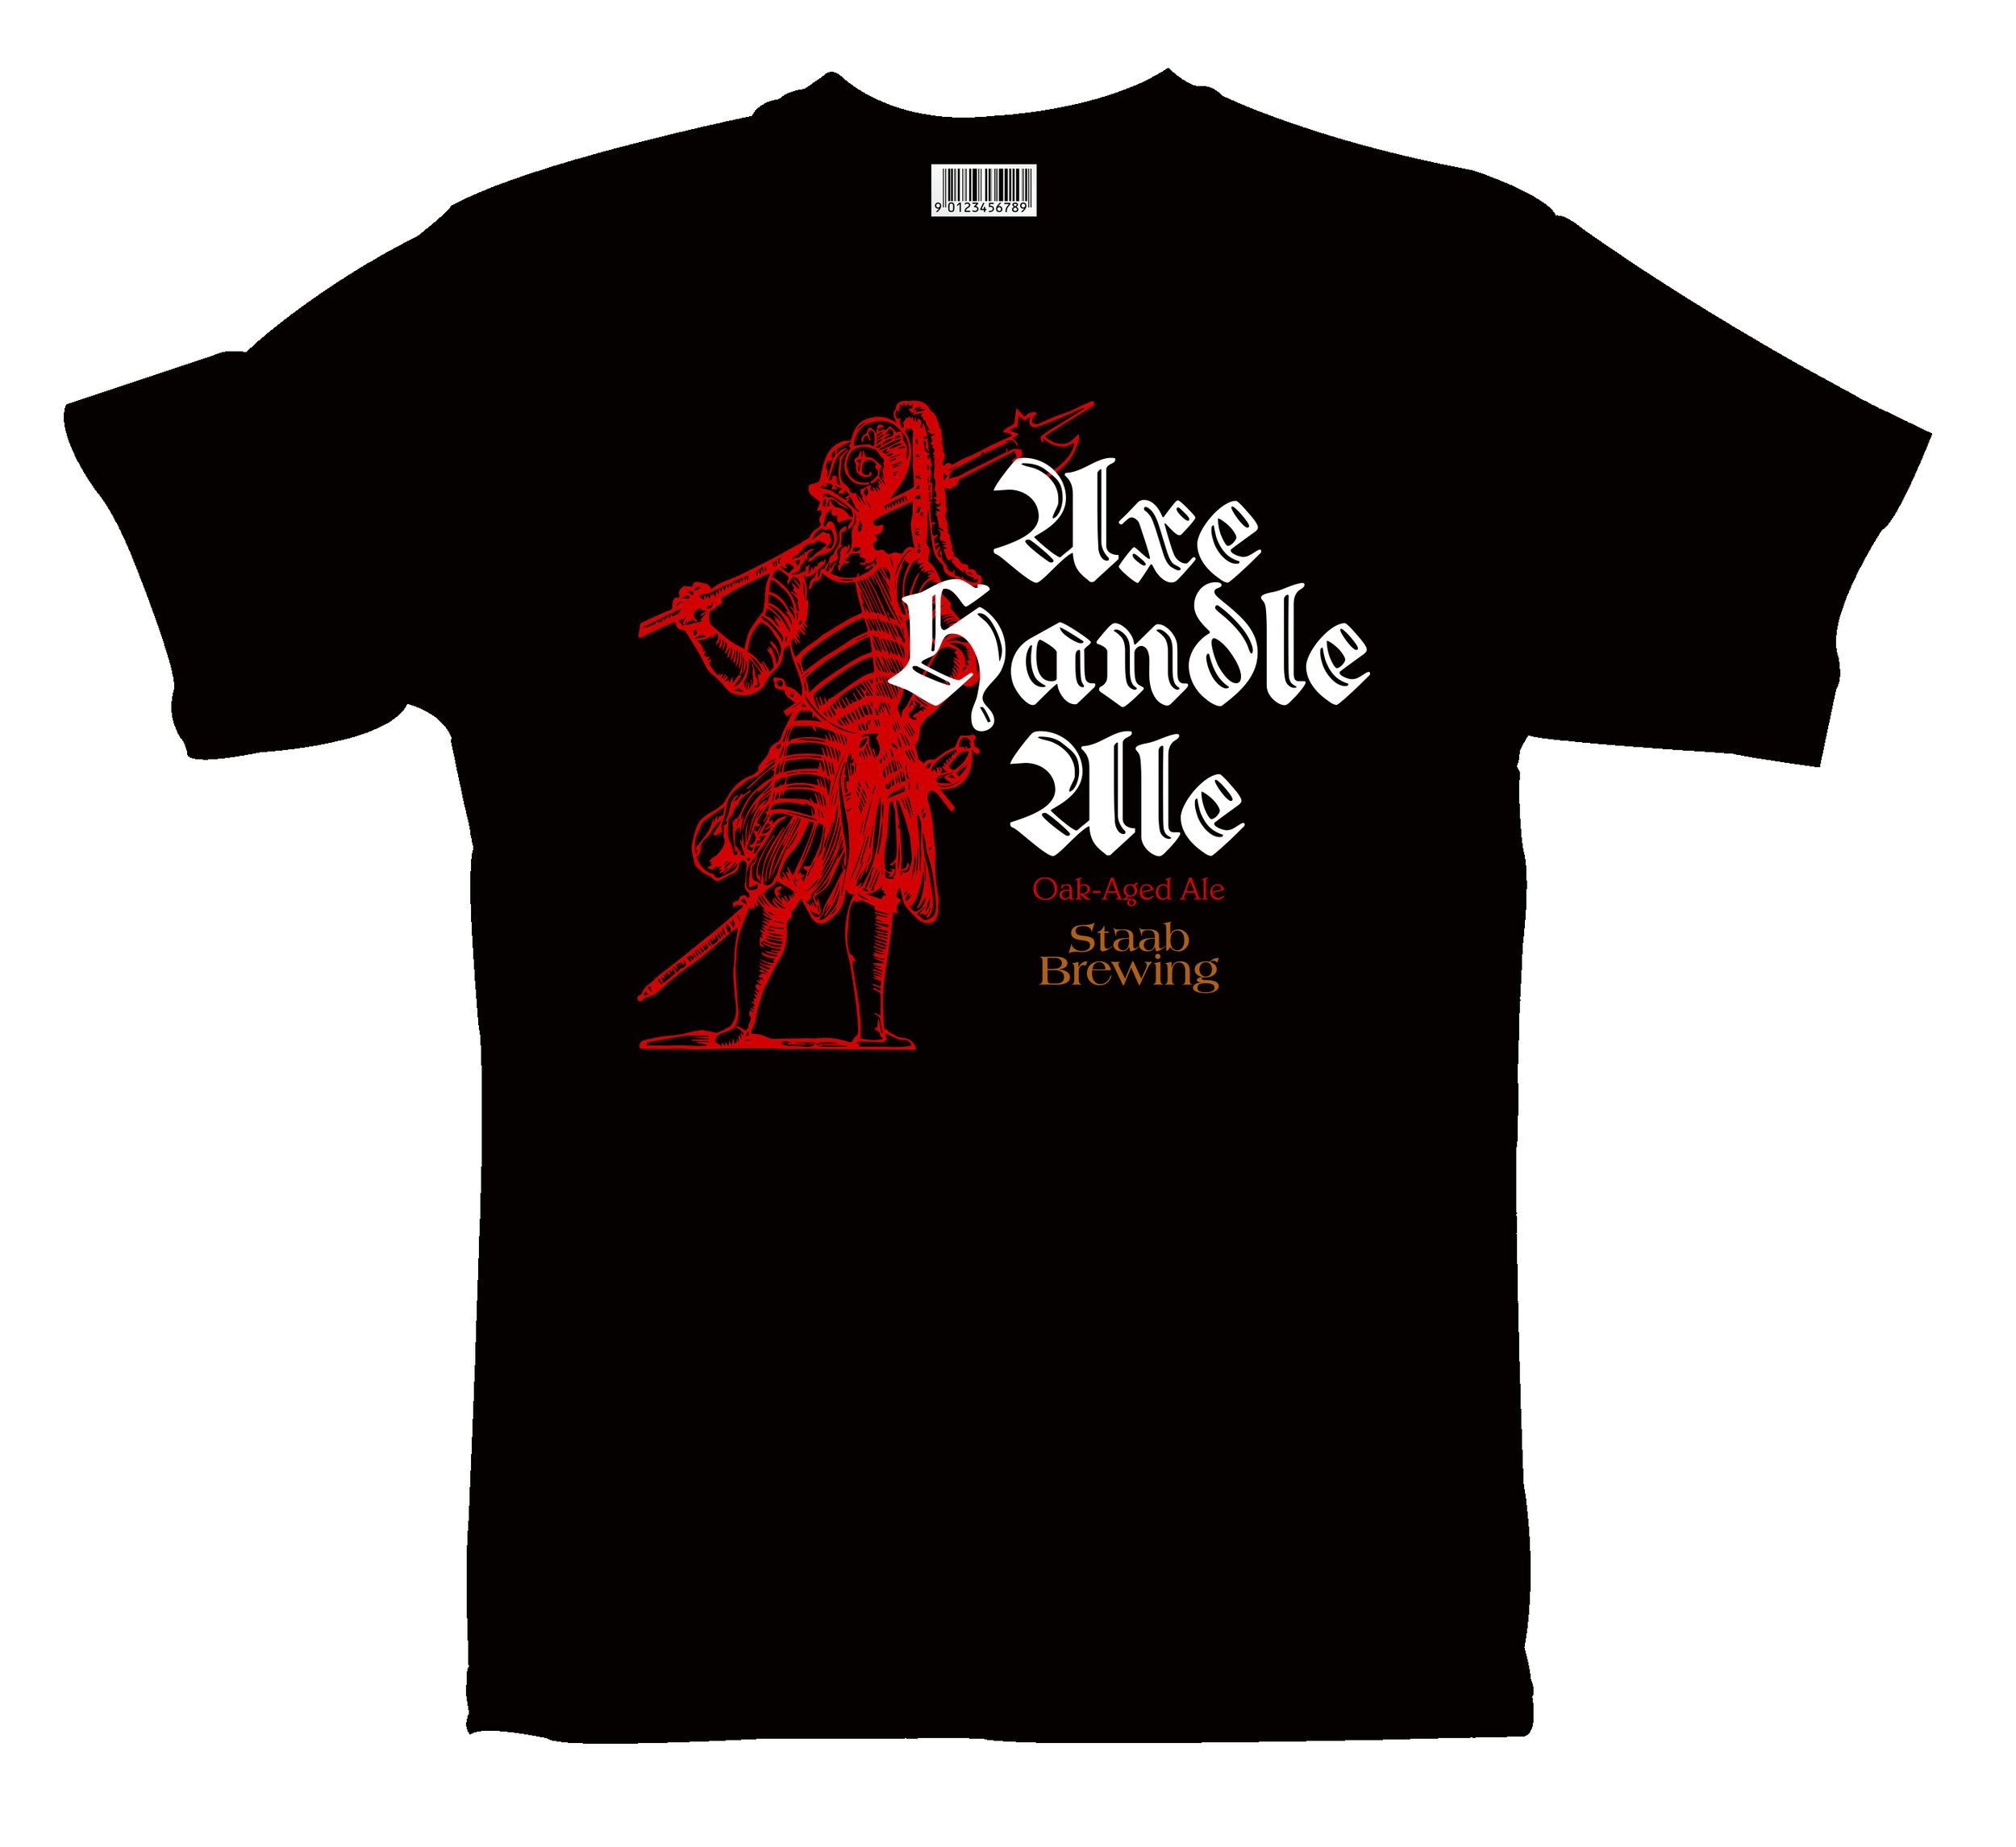 axe handle shirt.jpg